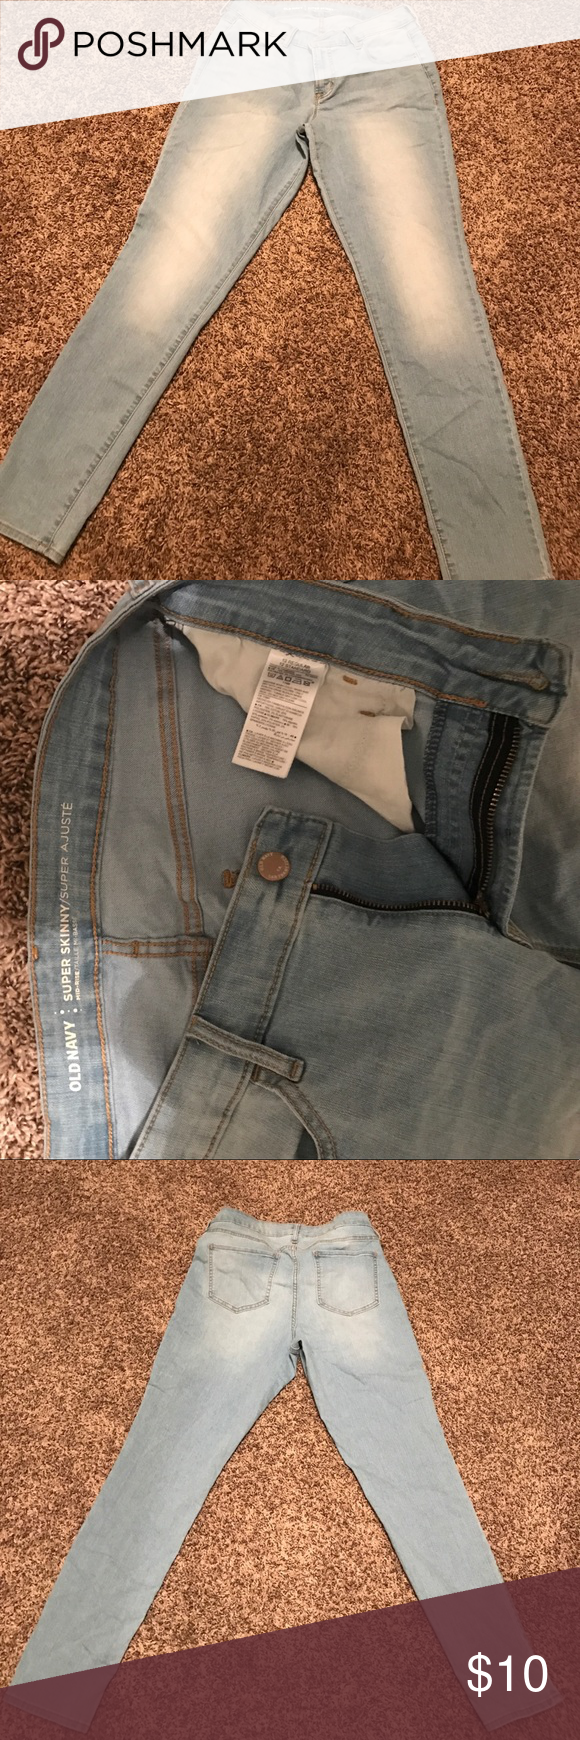 Old Navy Rockstar skinny jeans Size 12 regular Old Navy Jeans Skinny